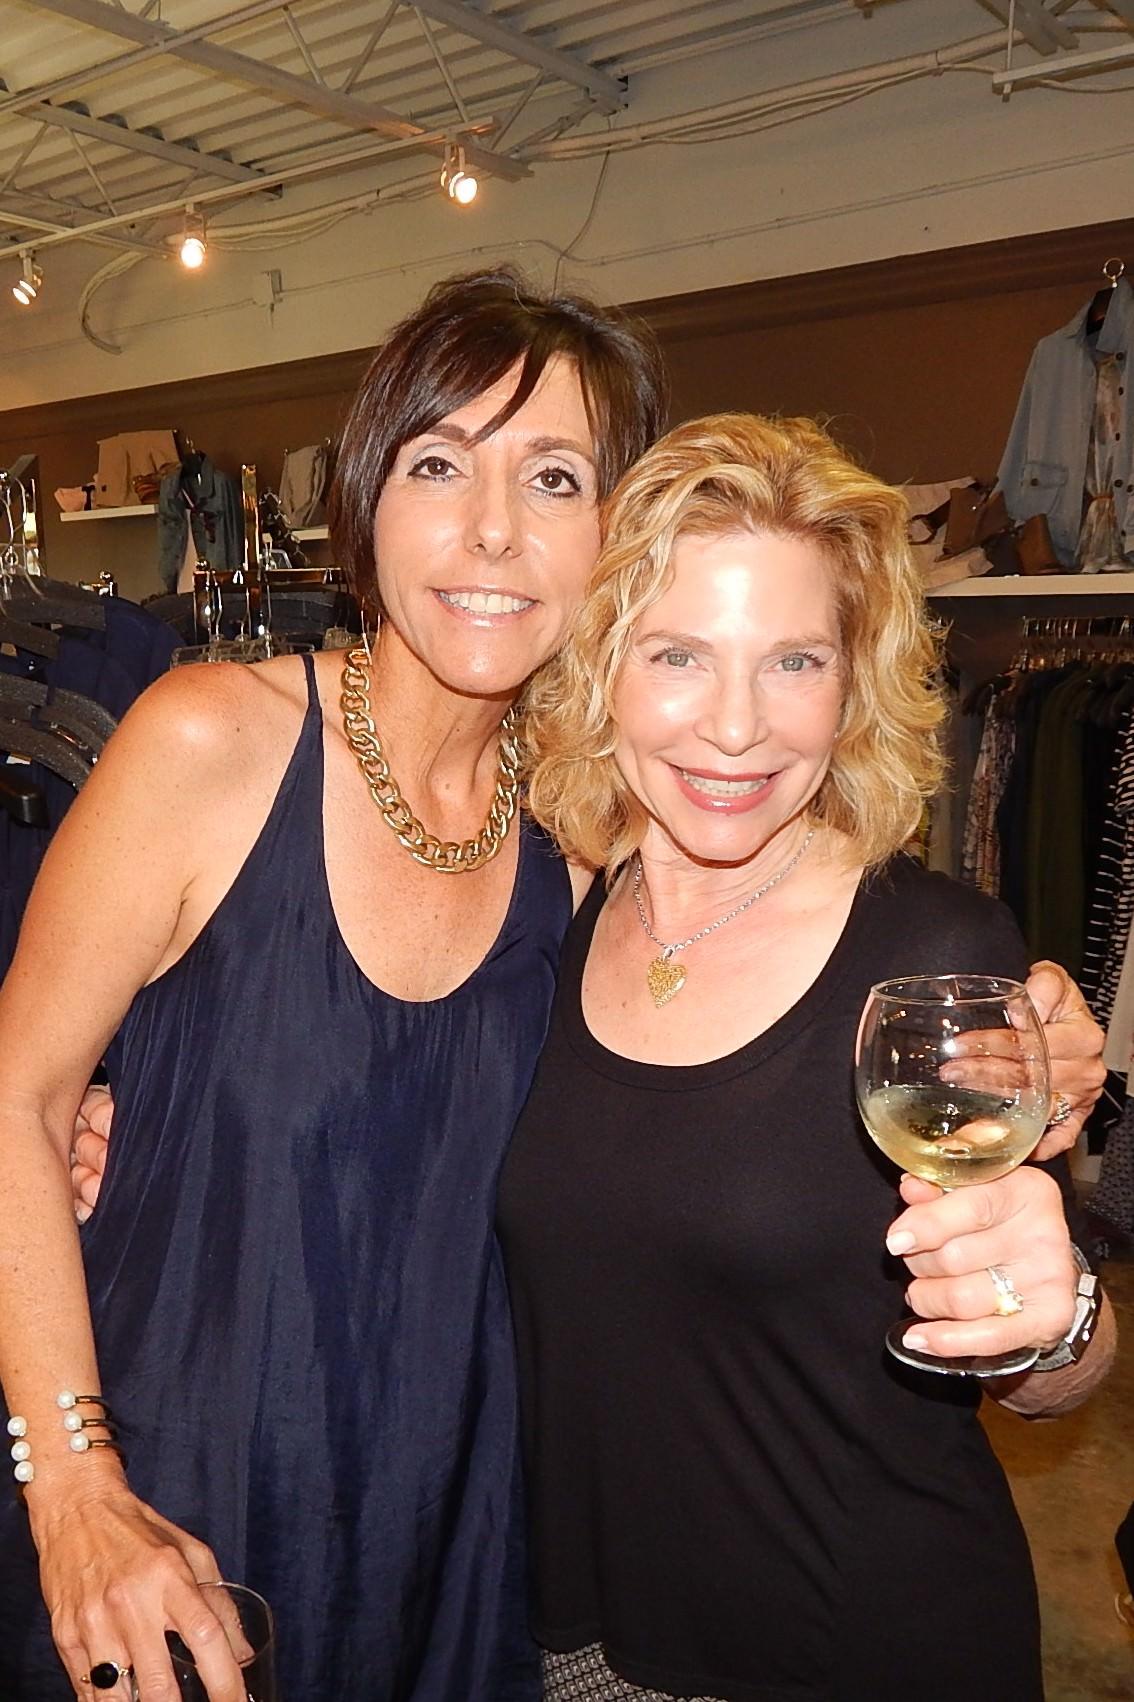 Jennifer Williams and Marie Taschner